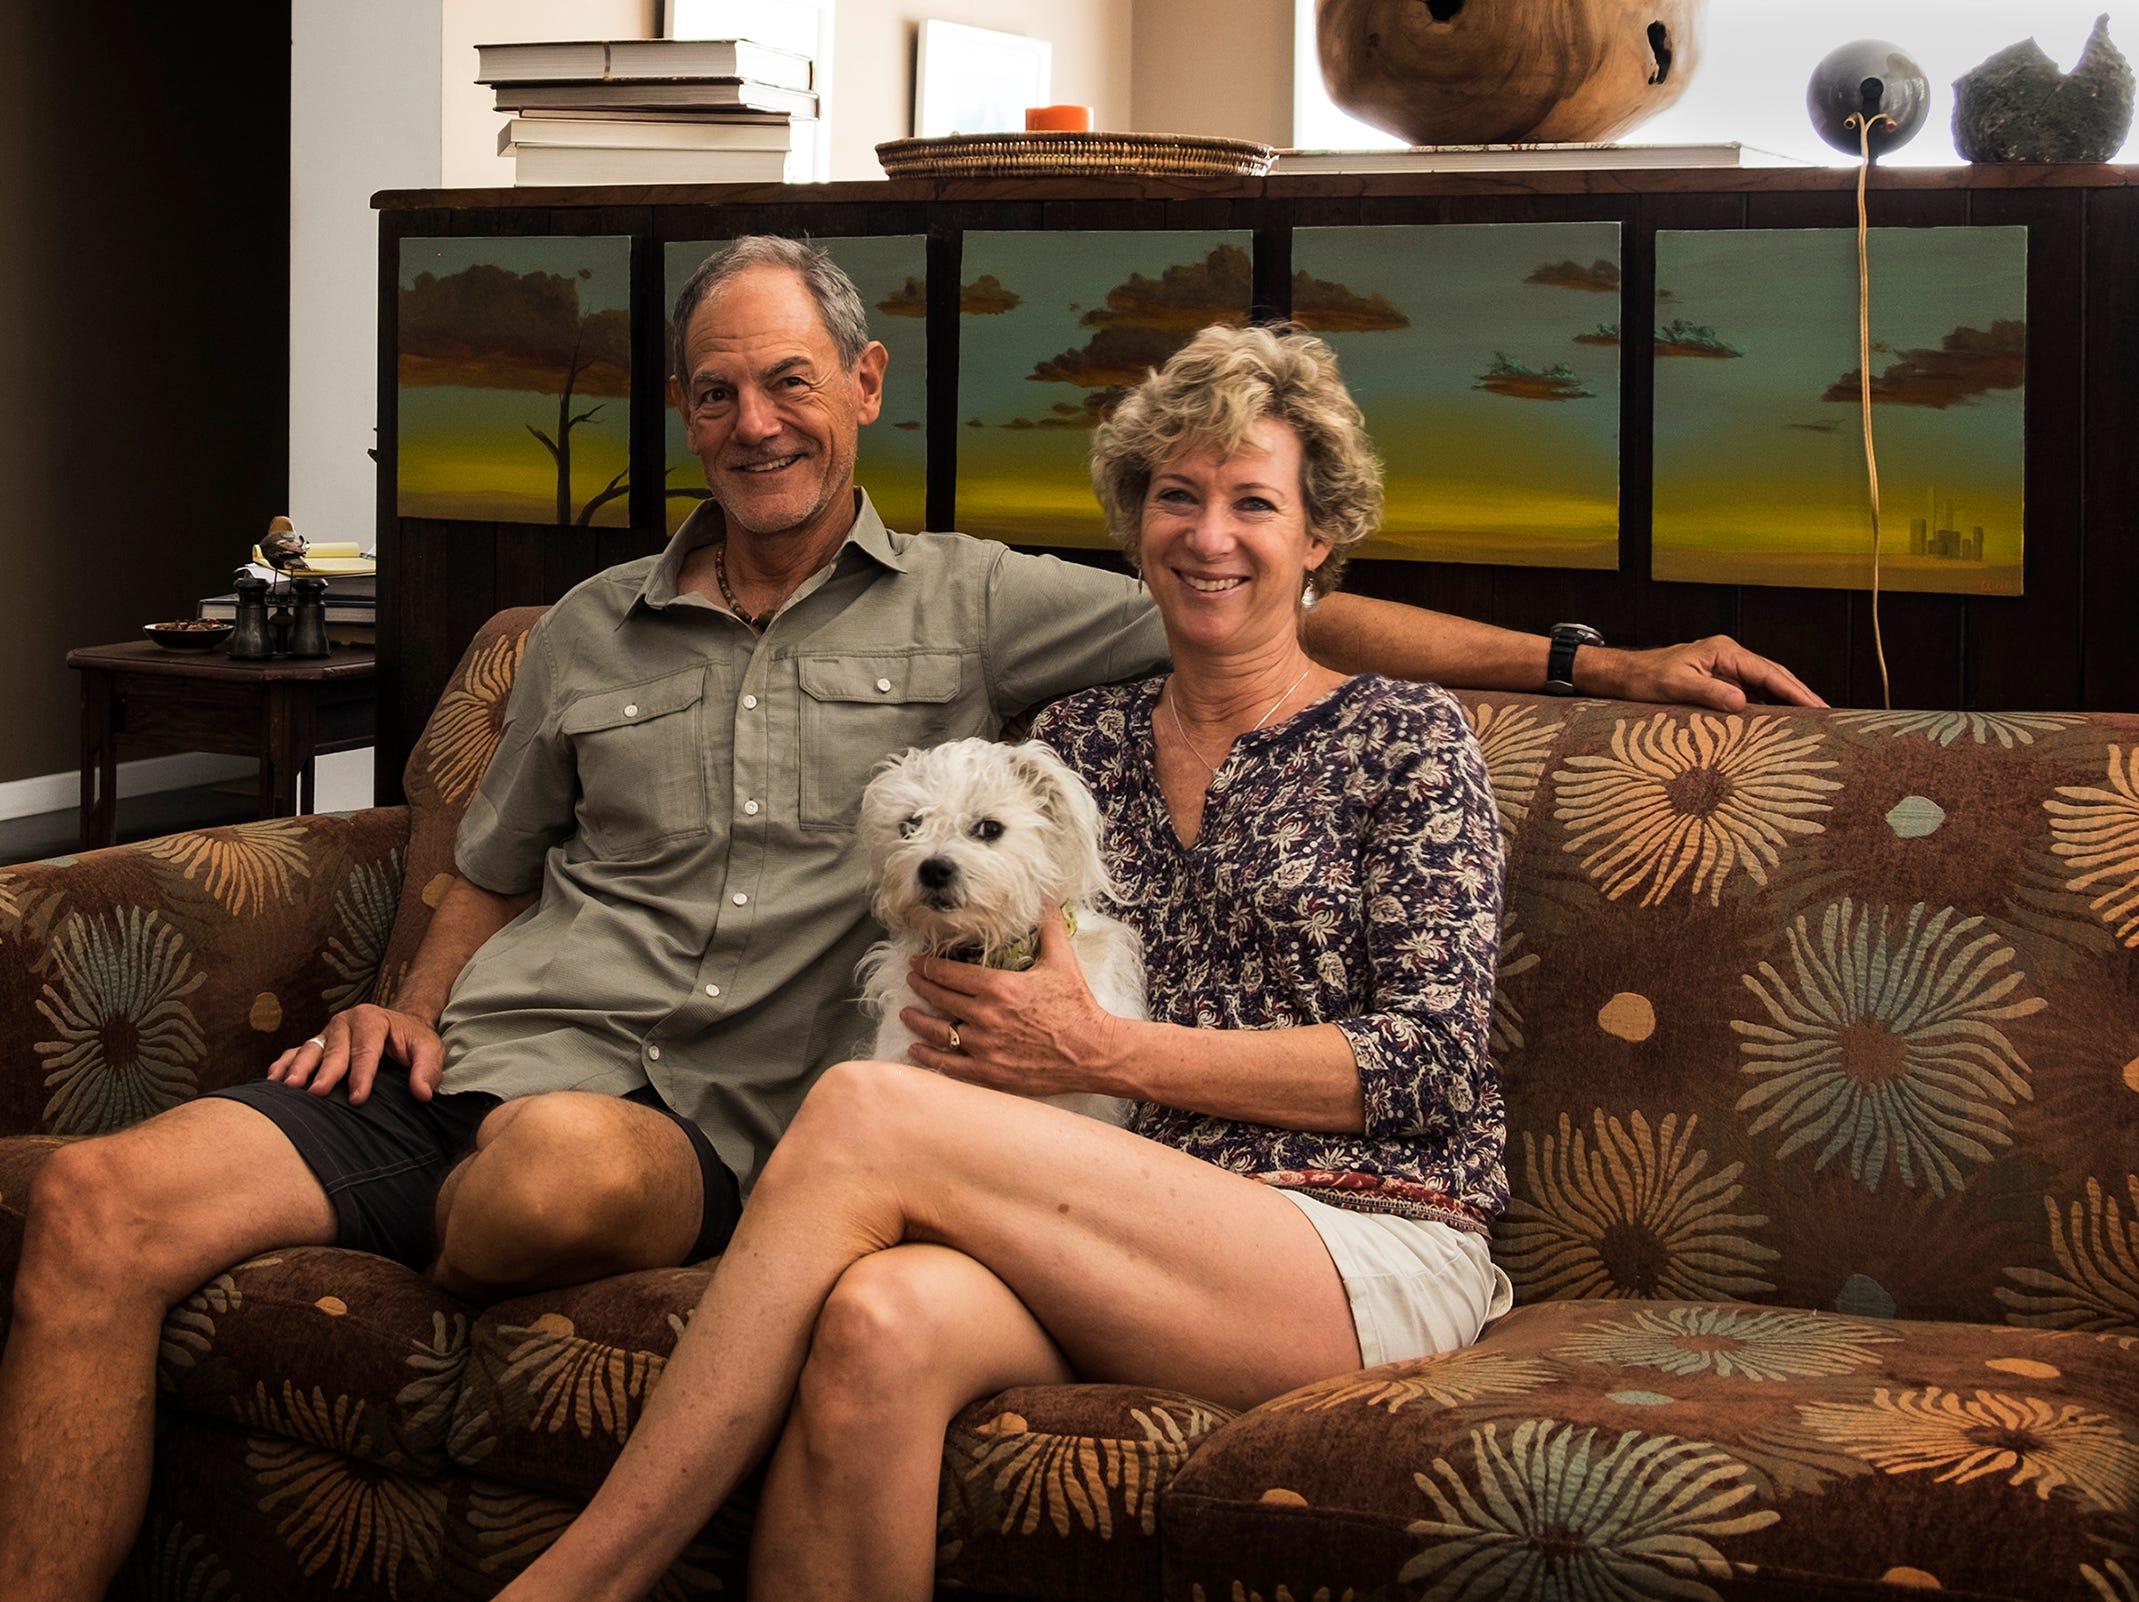 Steve Emrick and Liz O'Brien in their high-rise home.